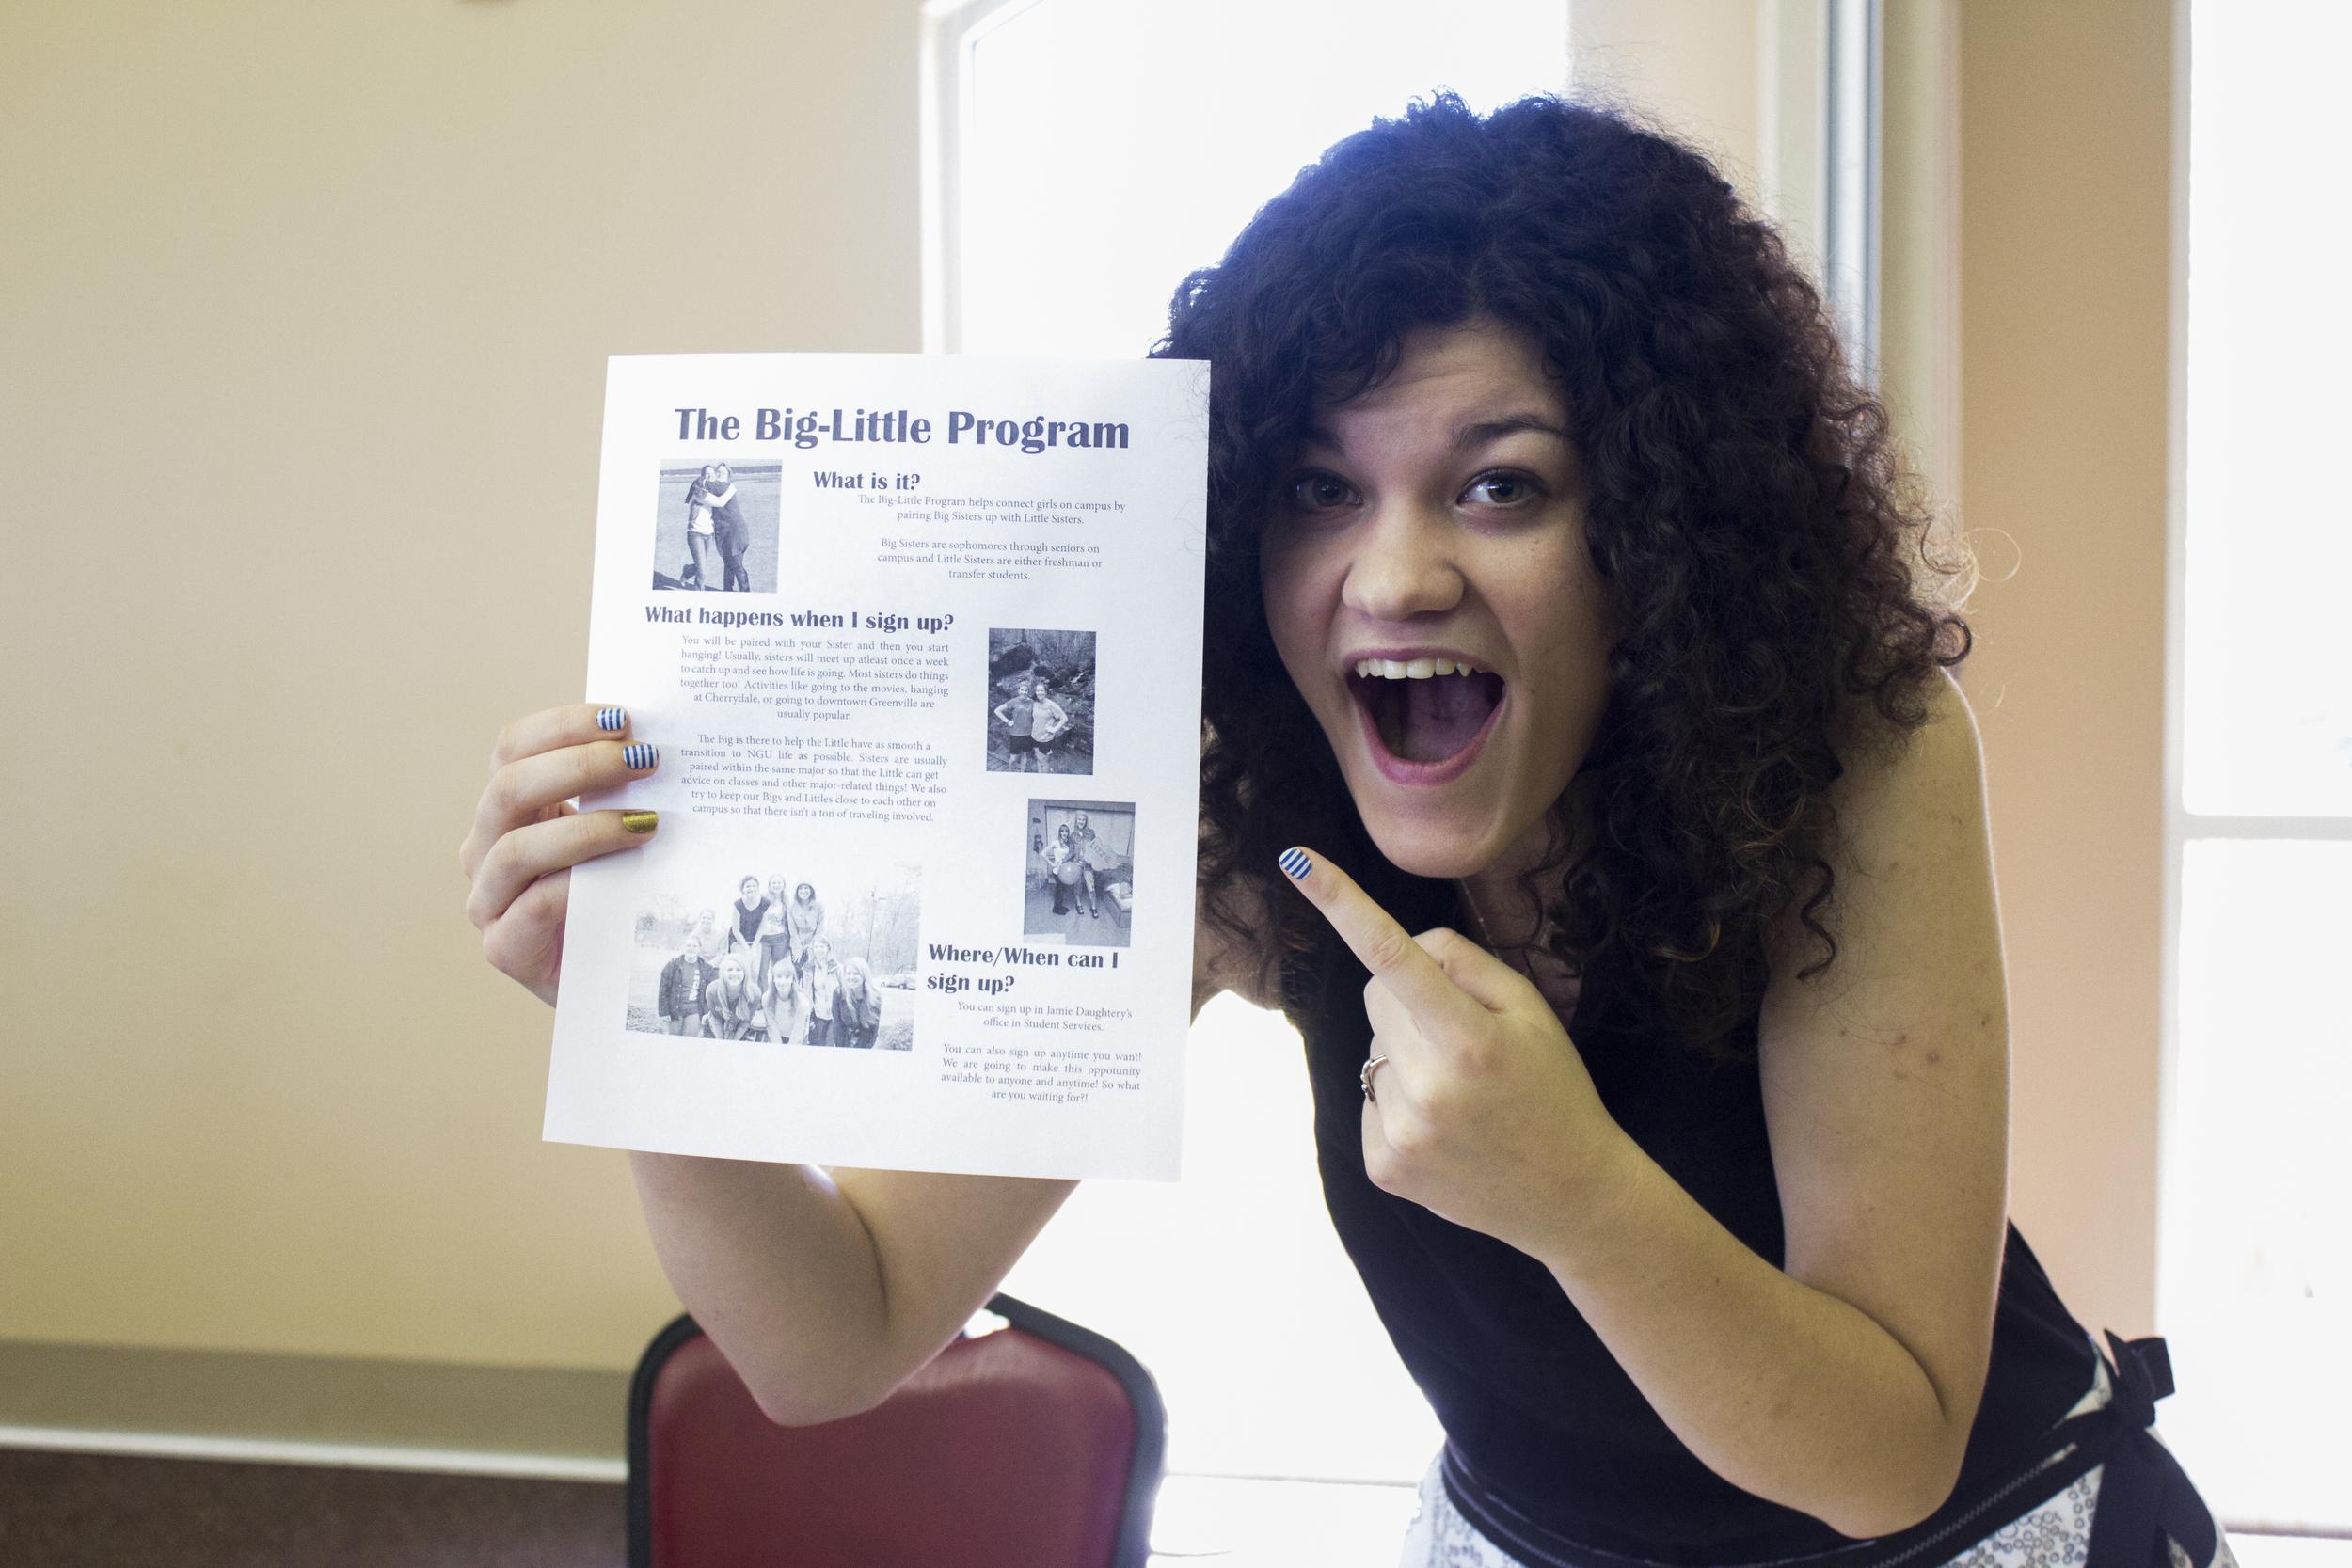 NGU studentKatie Gaylean expresses her excitement about the Big-Little Program NGU has for interestedincoming freshman.